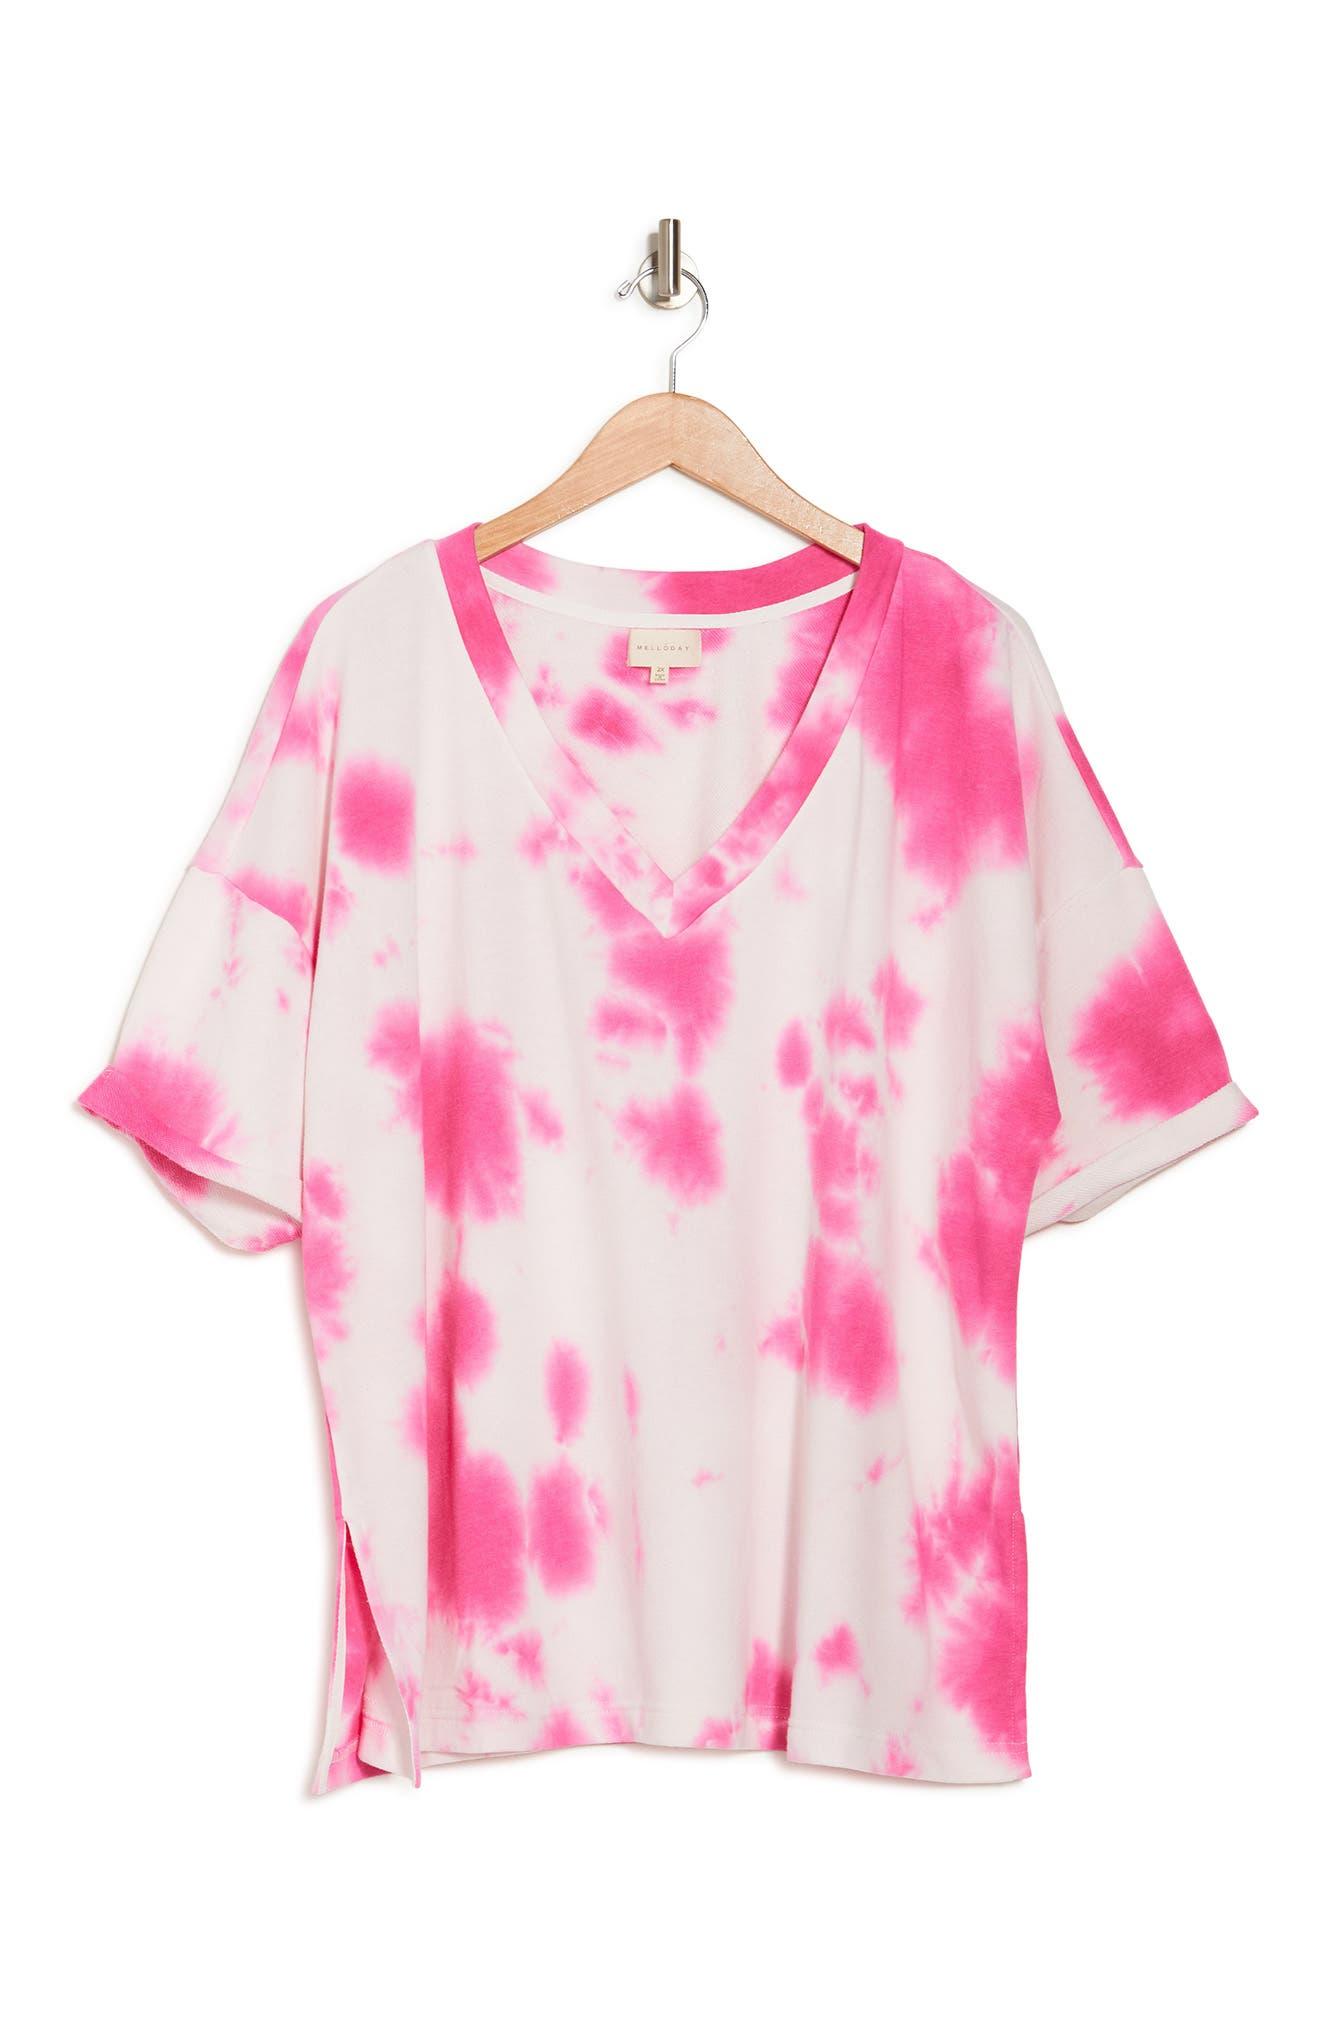 Melloday Tie-dye V-neck T-shirt In Hot Pink